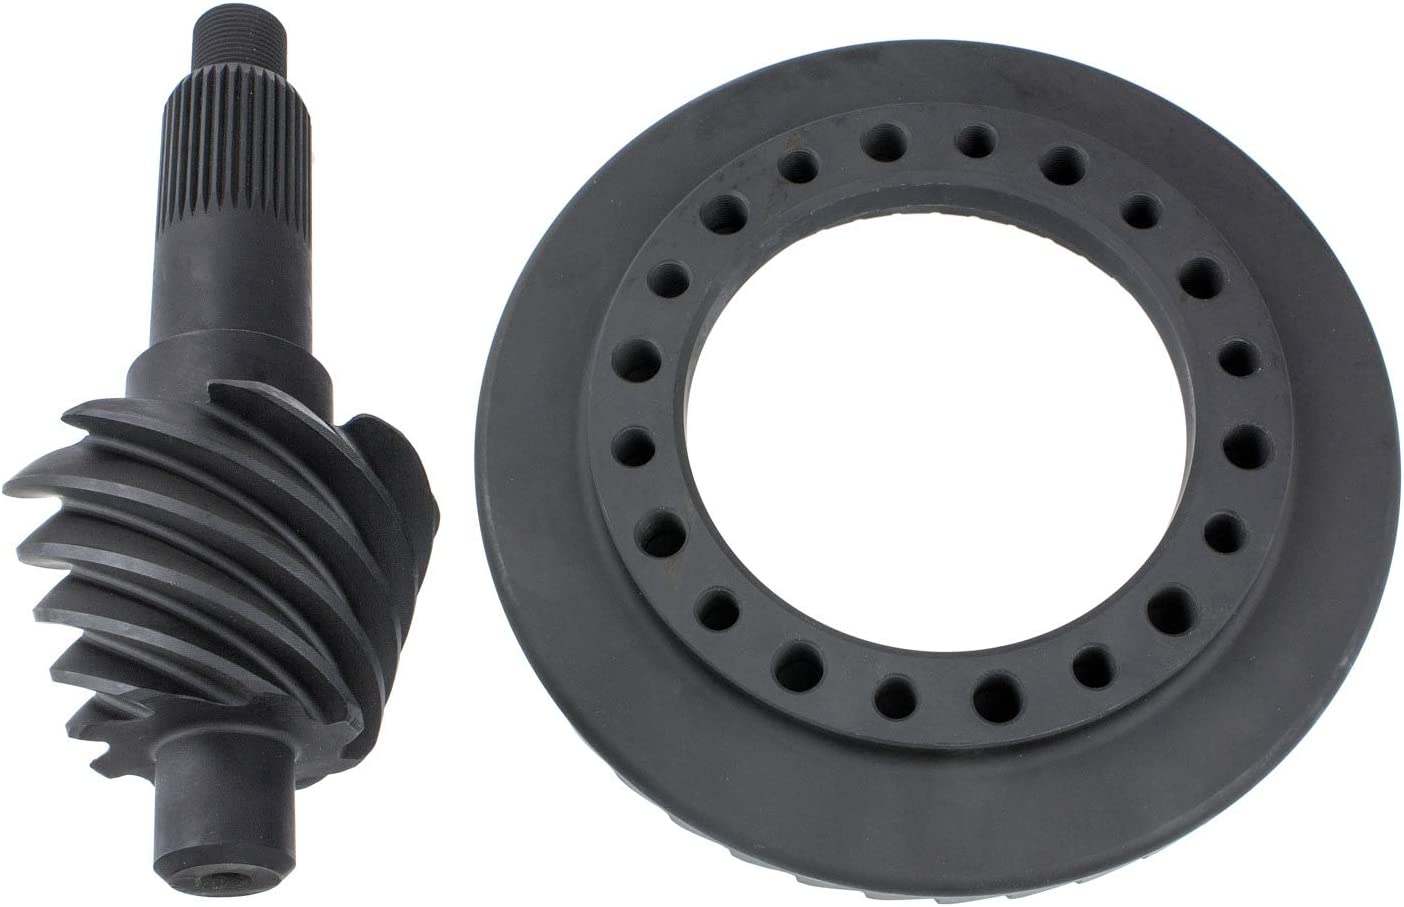 Motive Gear MG1310-1256 Pinion Yoke Motive Gear Performance Differential